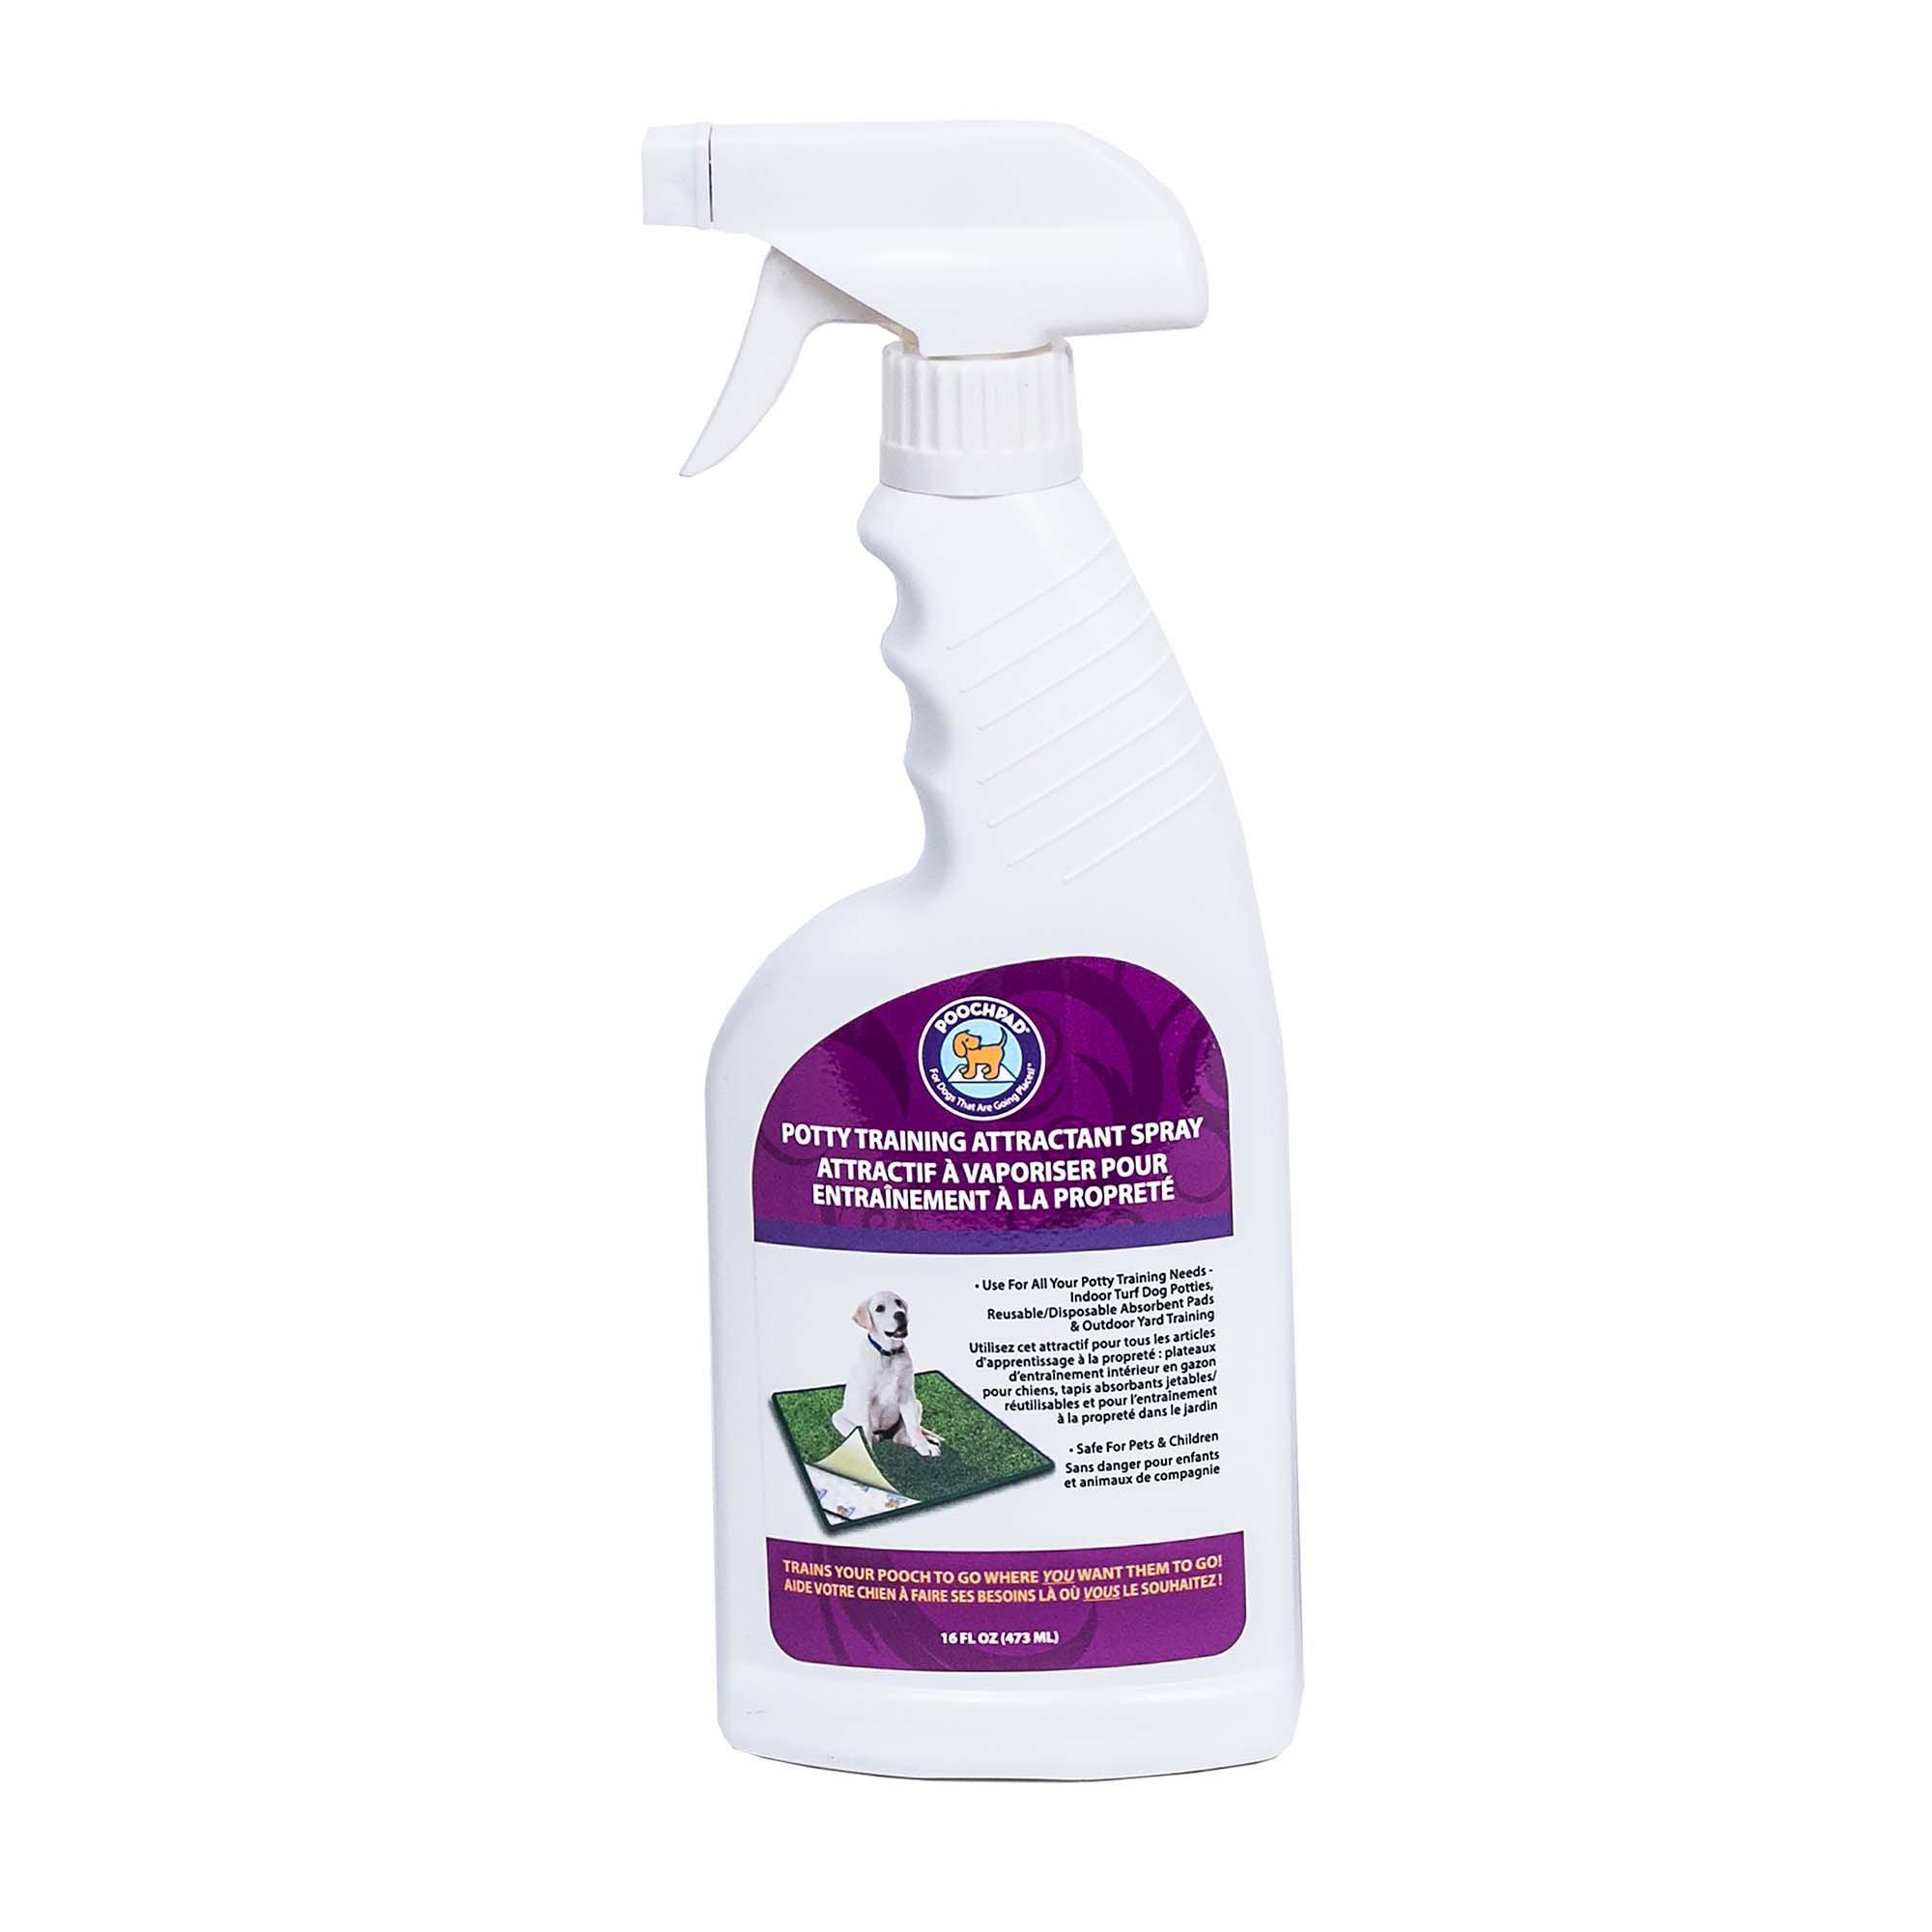 dog potty training spray reviews